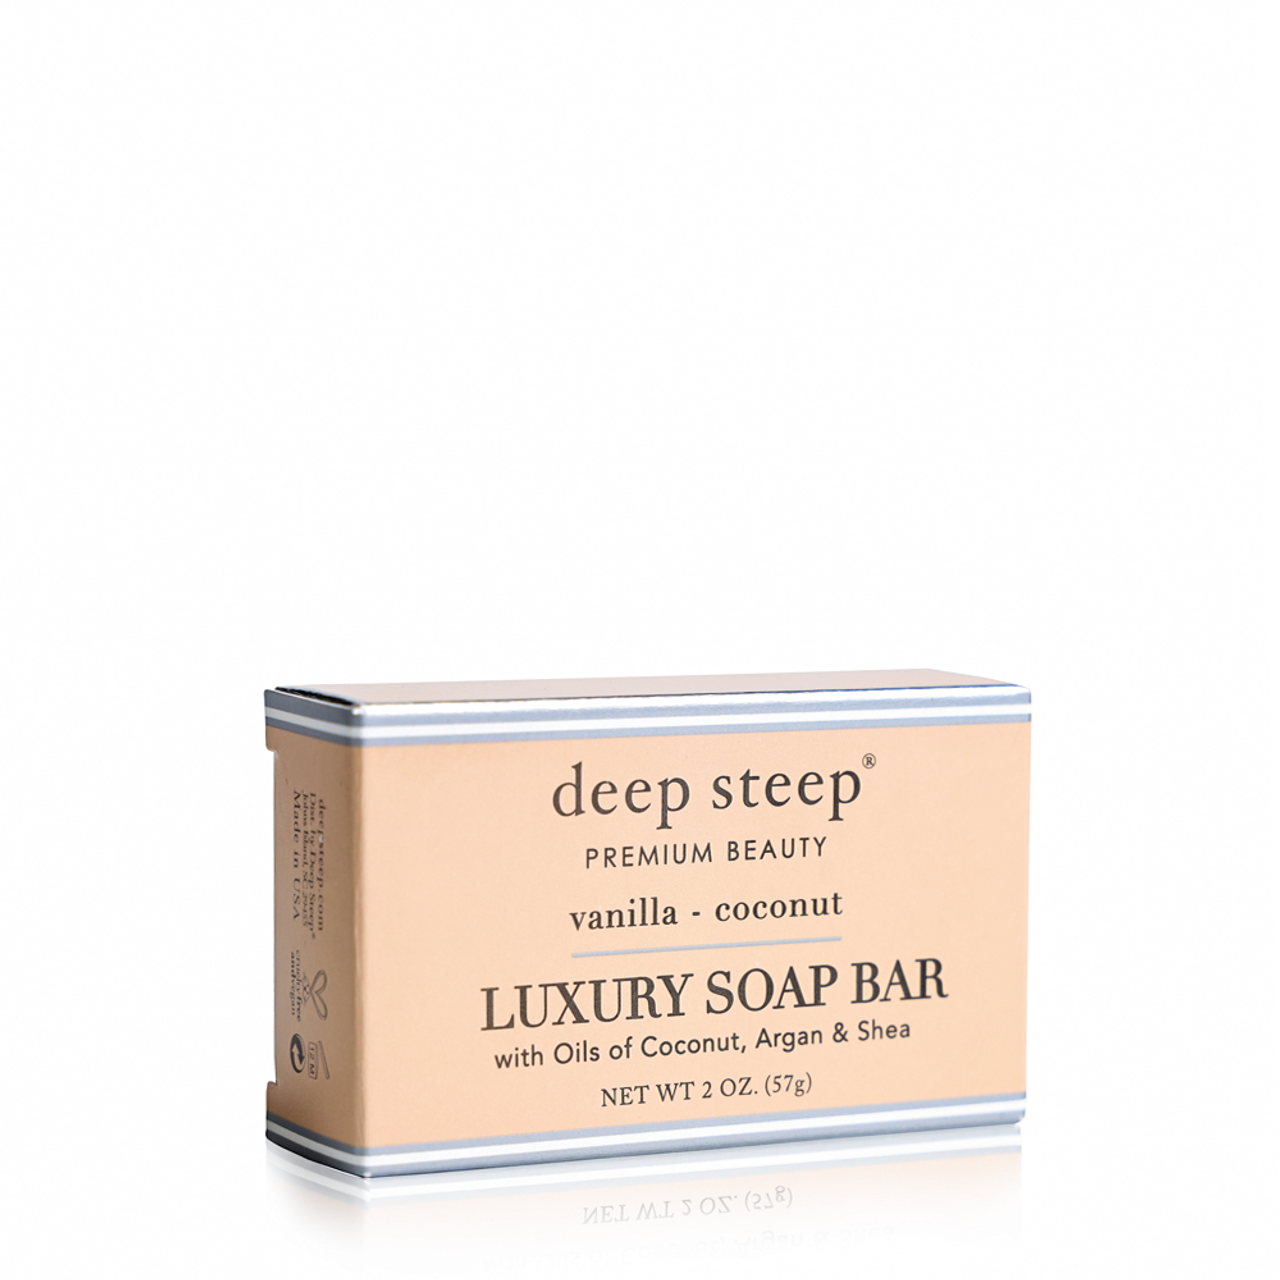 Luxury Soap Bar Vanilla Coconut - Front